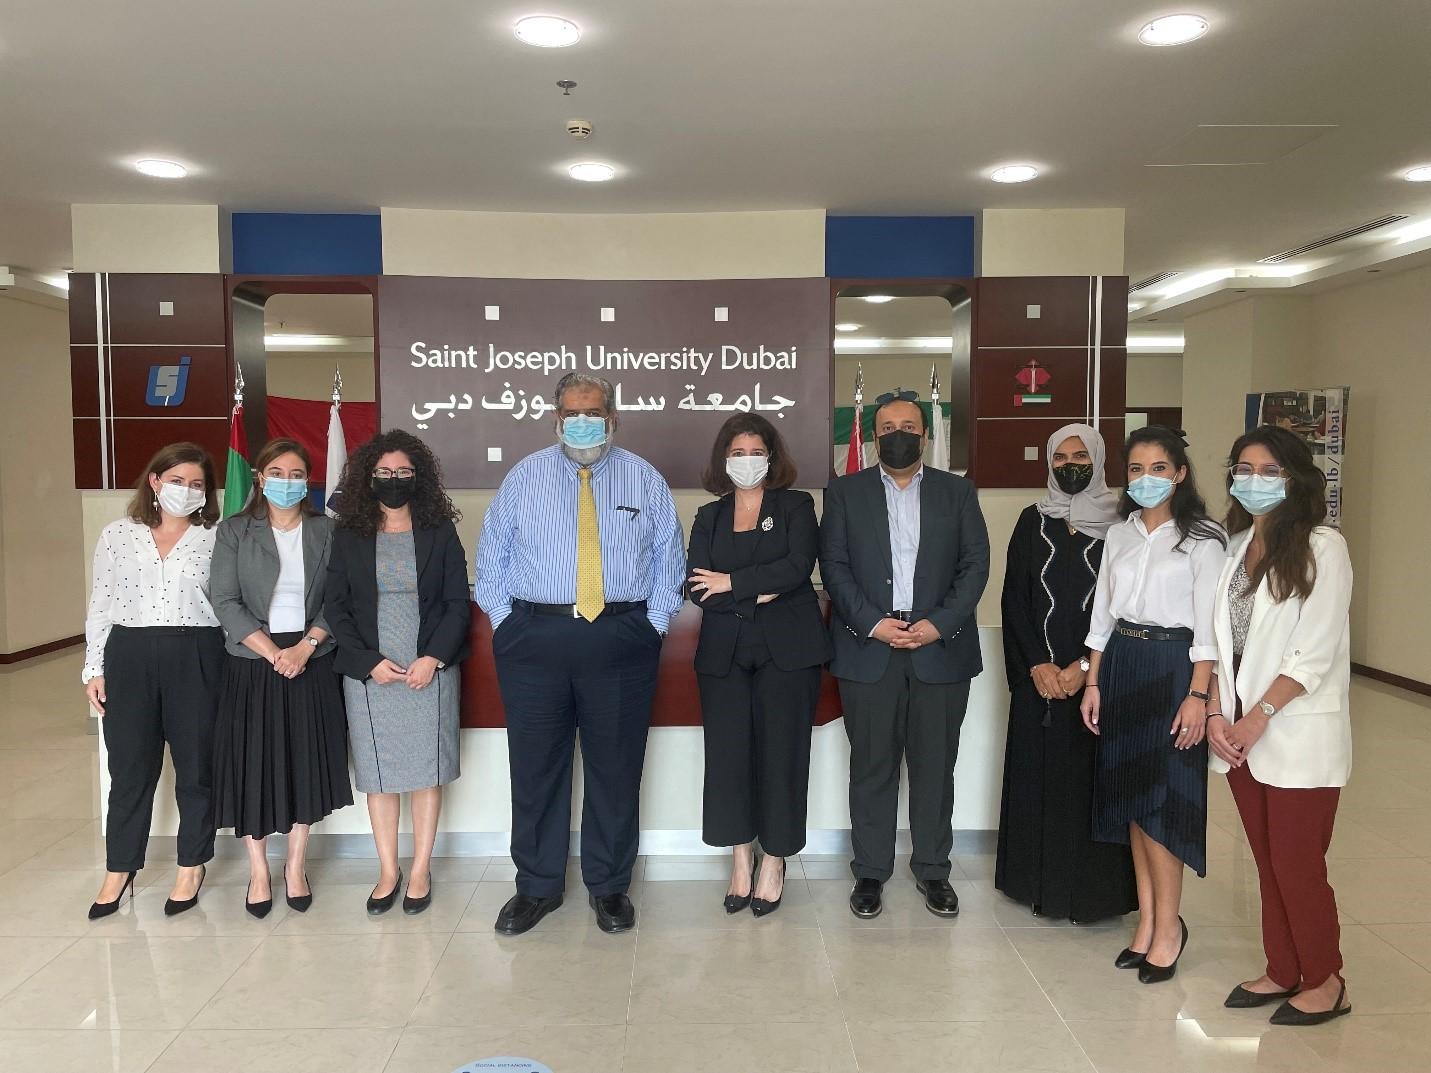 Saint Joseph University Dubai receives two visits from the CAA - Saint Joseph University - Dubai